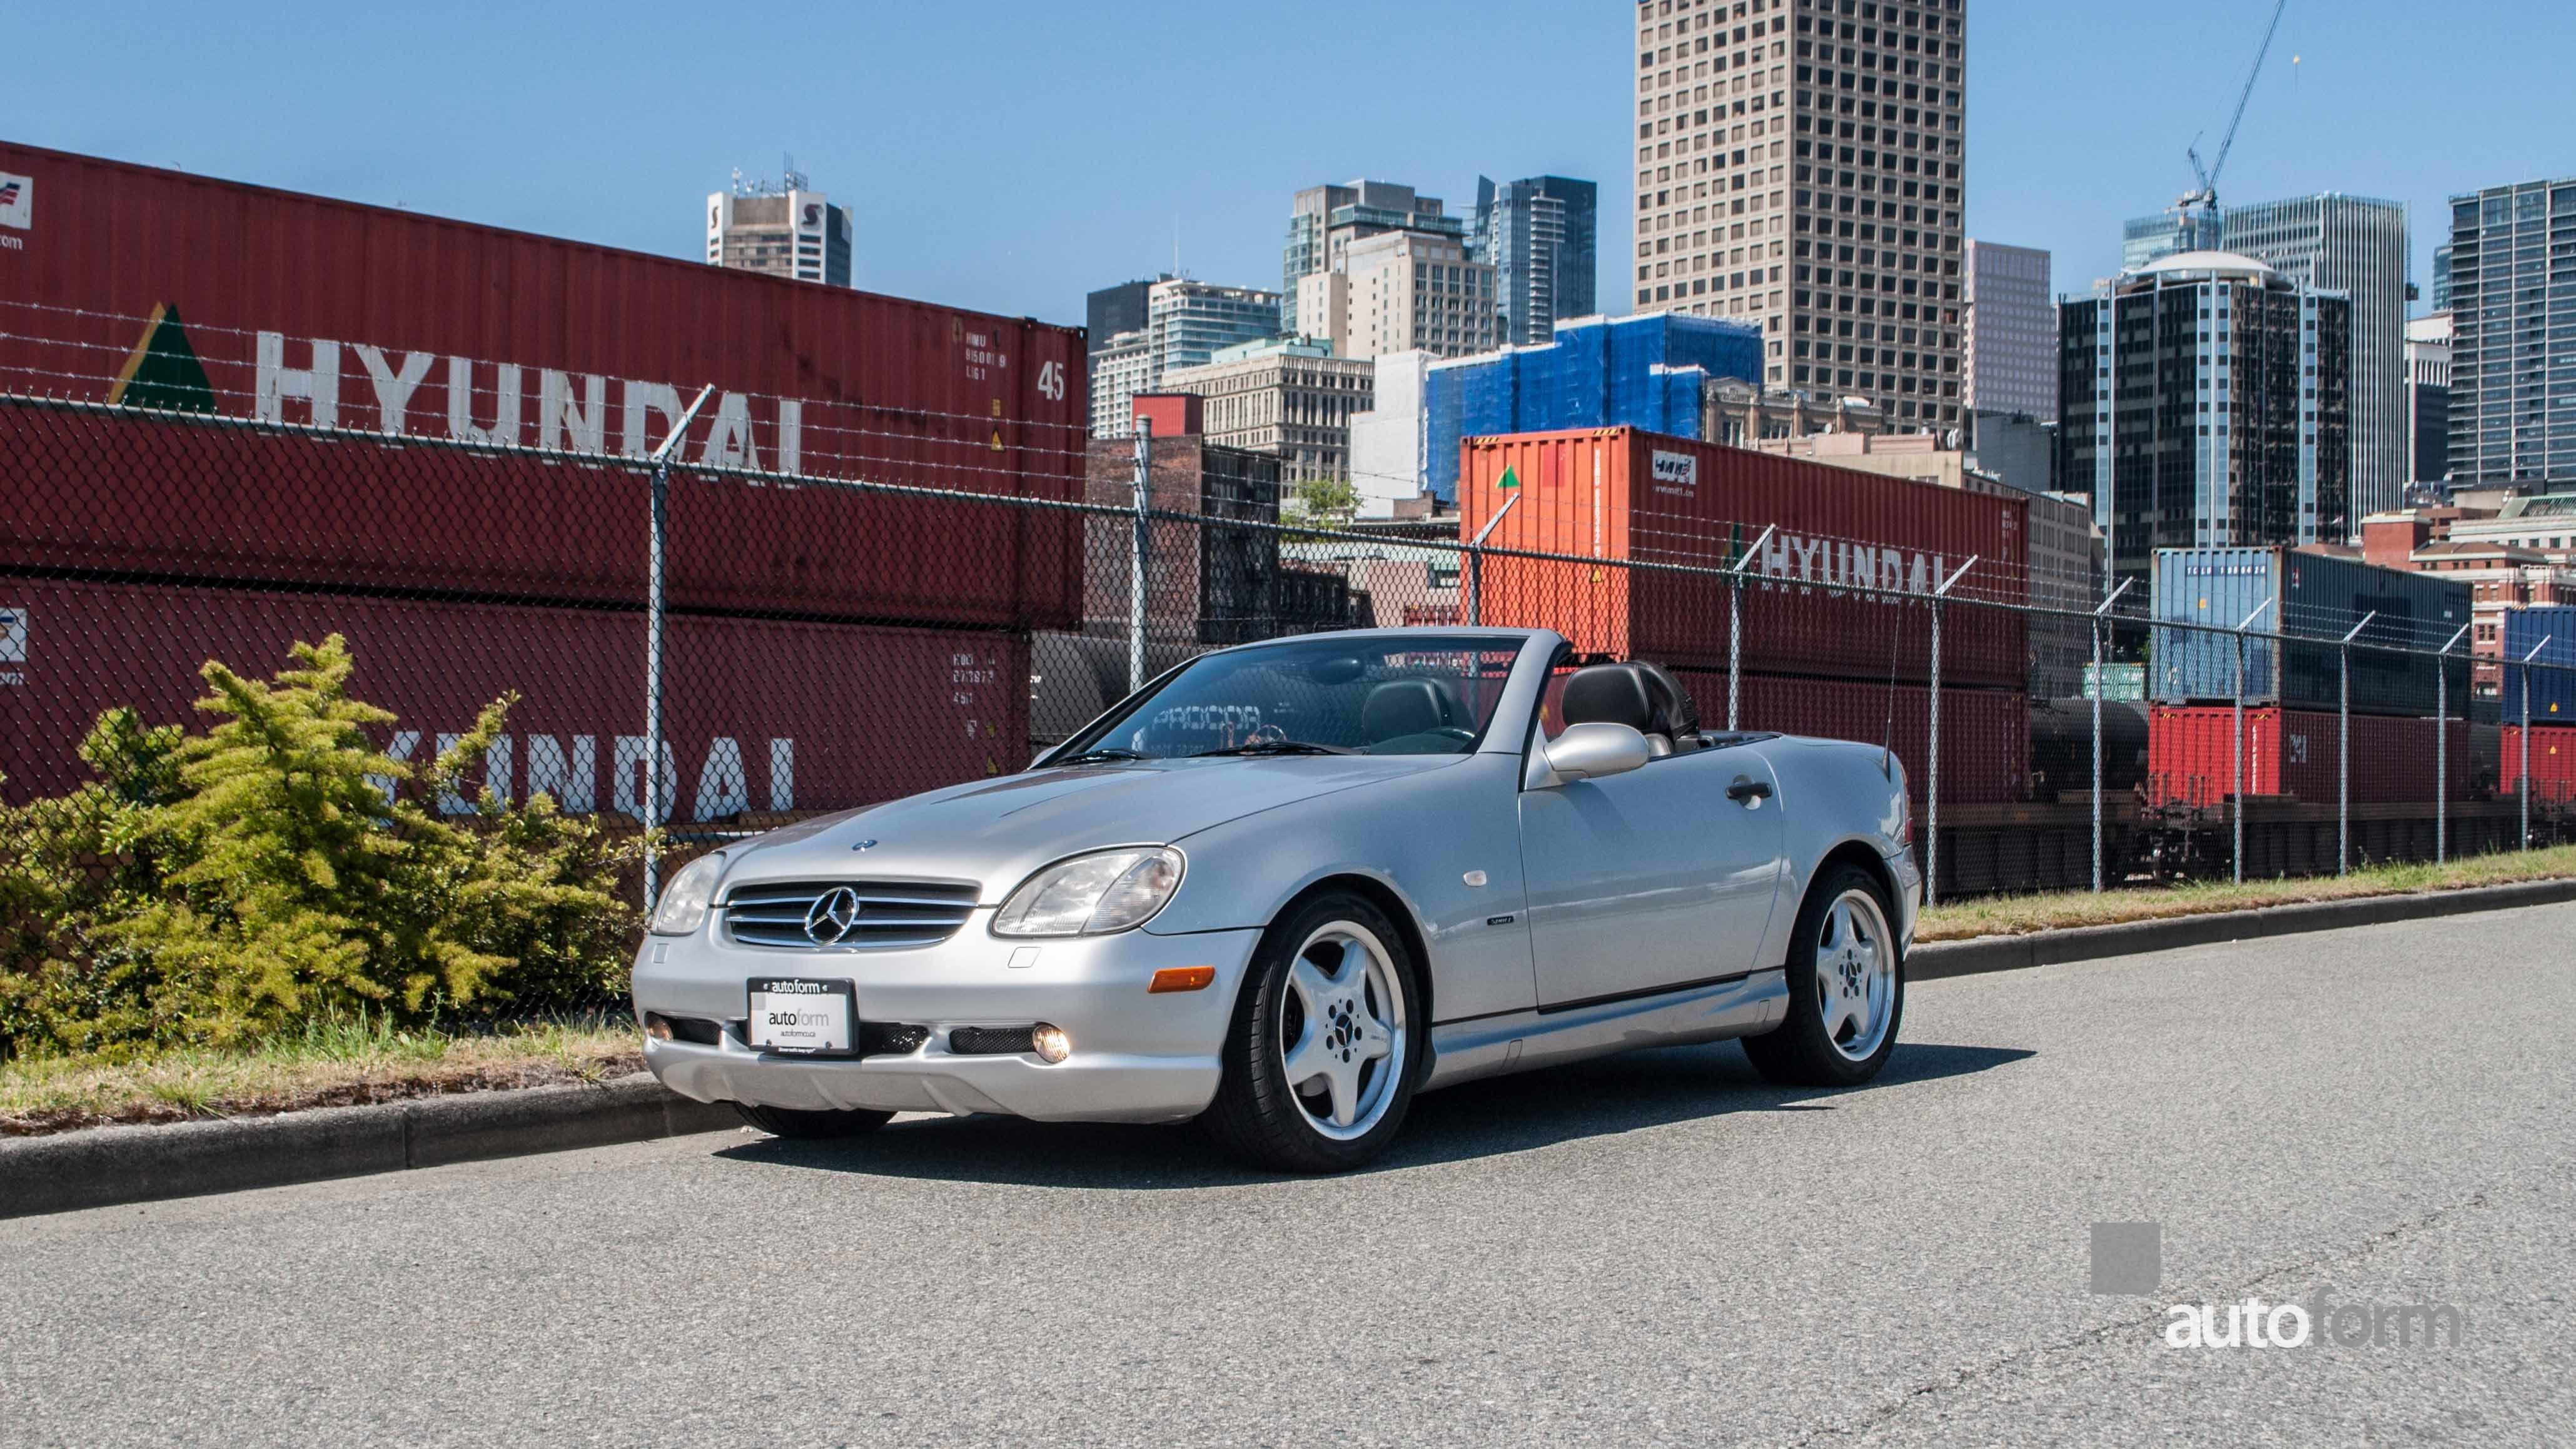 1999 mercedes benz slk230 autoform for Mercedes benz dealer in bakersfield ca